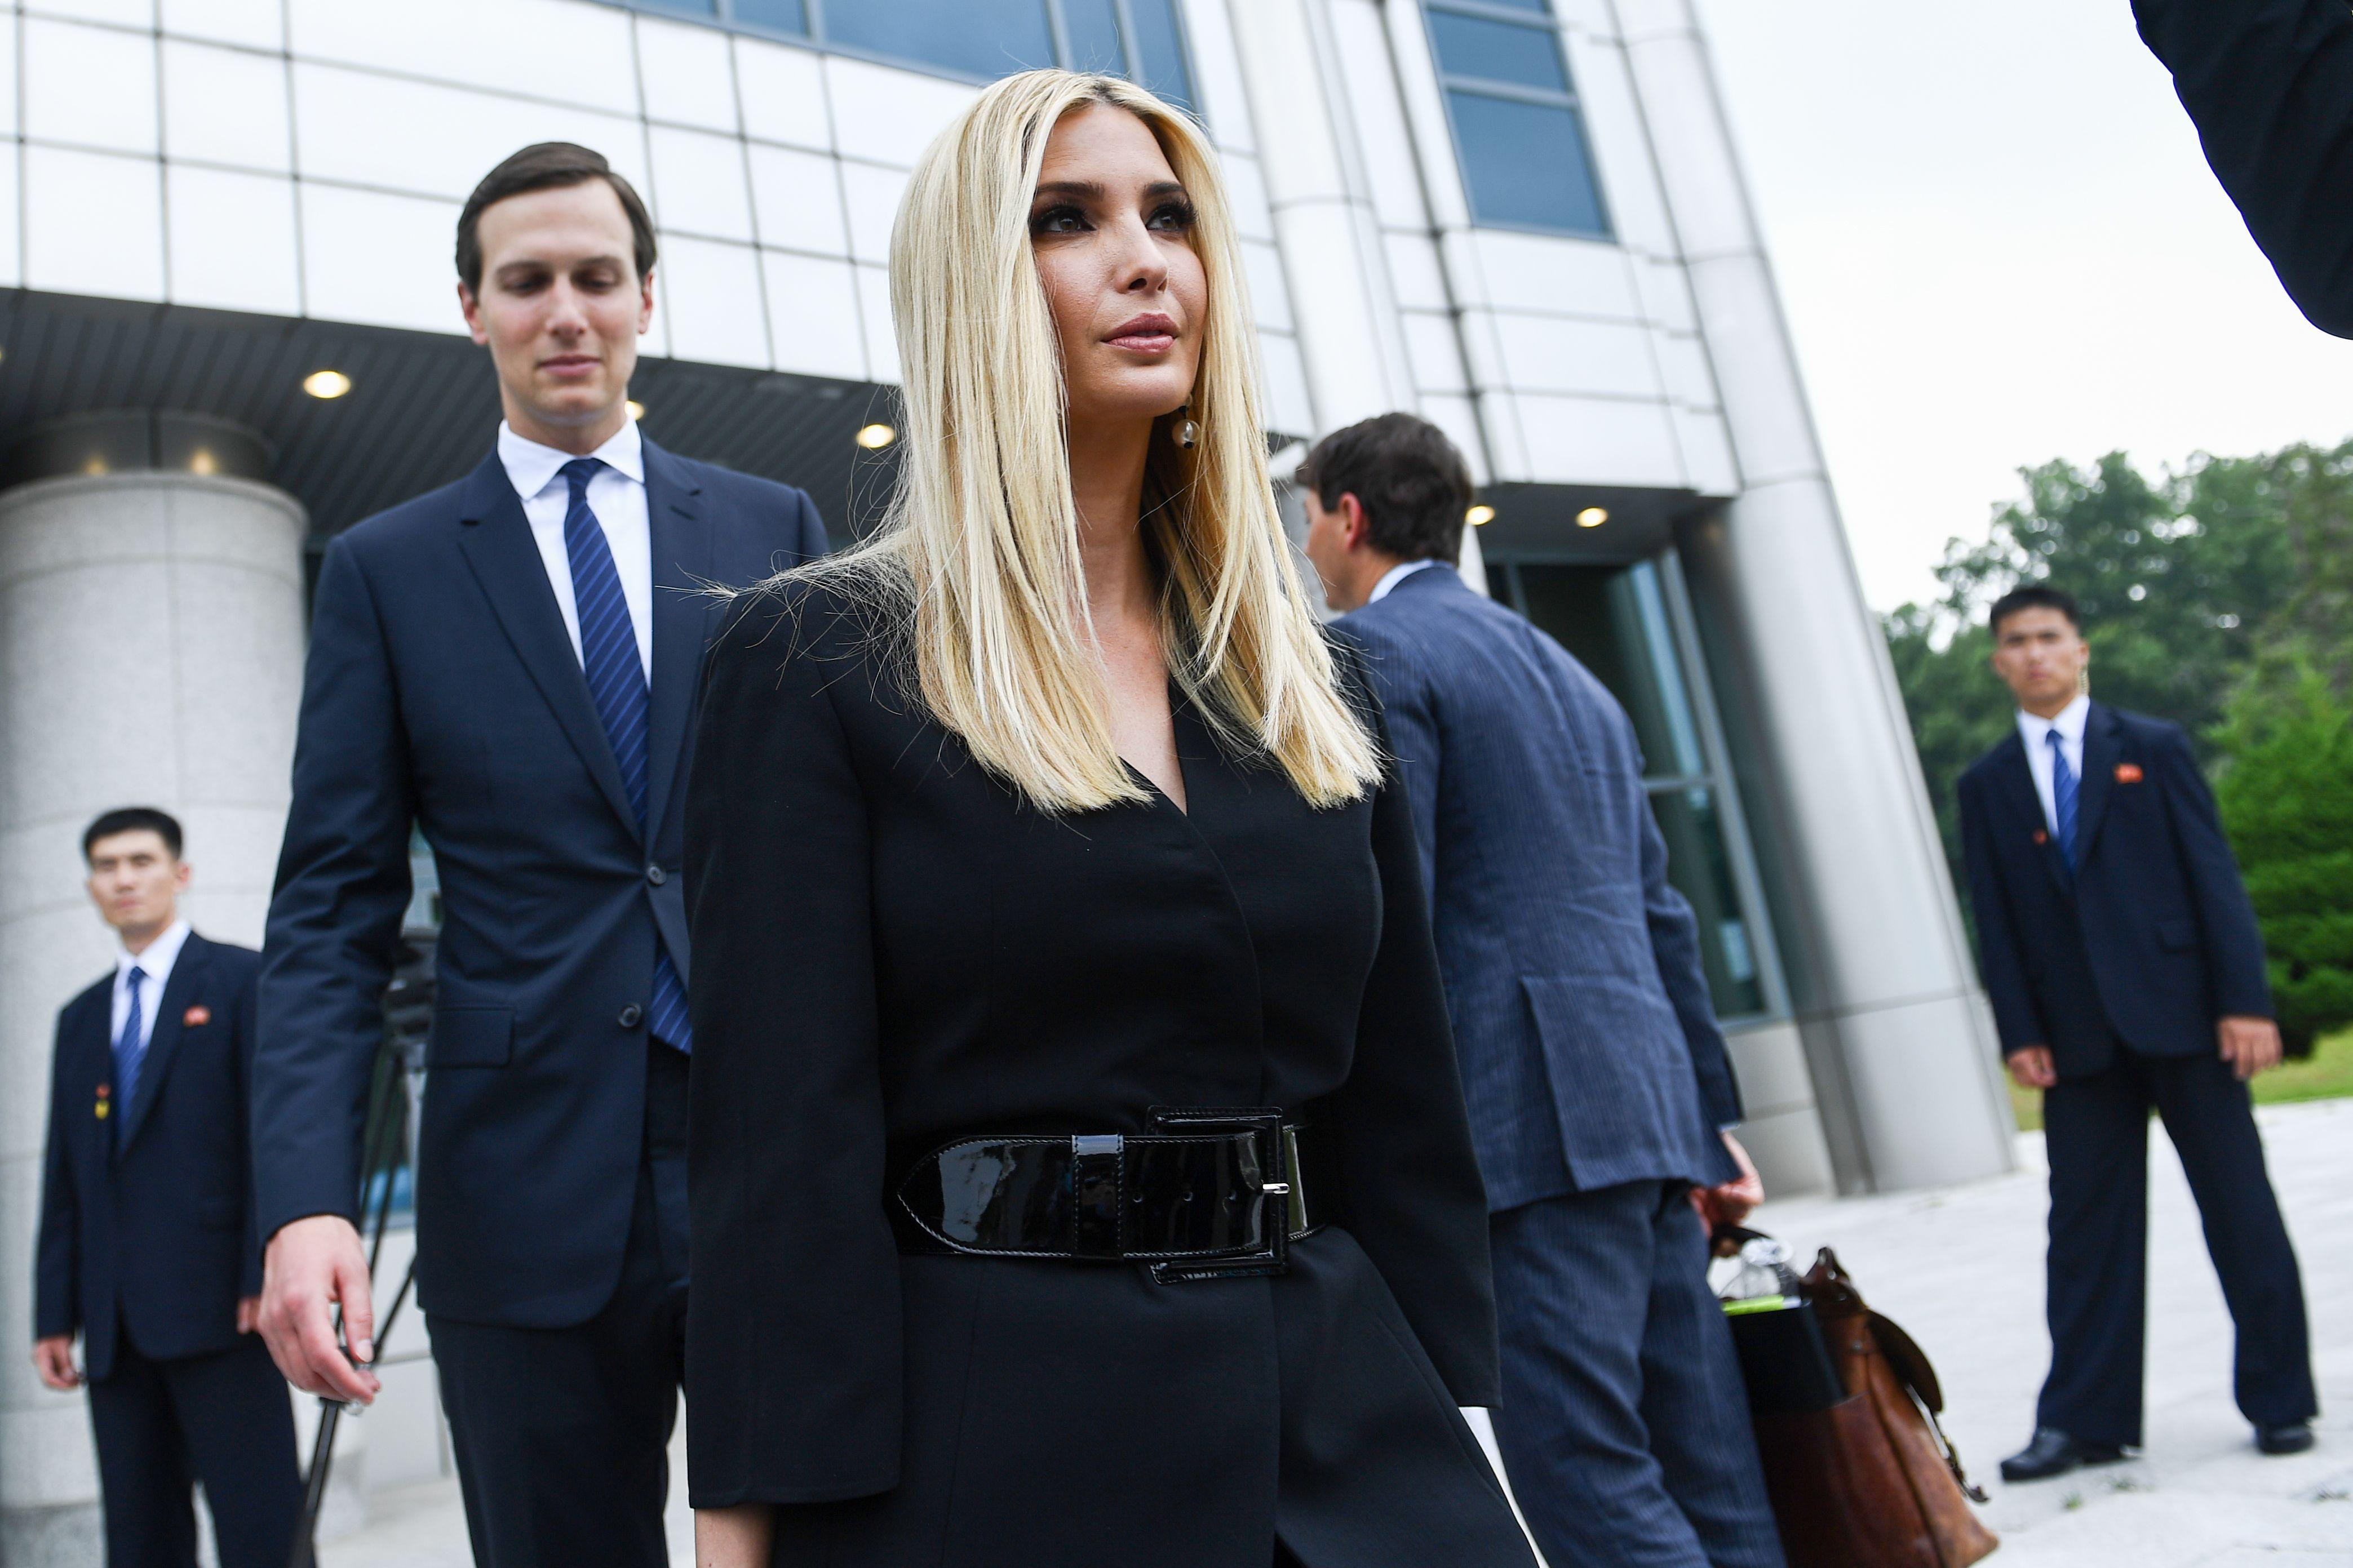 Advisor to the US President Ivanka Trump (R) and US Senior Advisor Jared Kushner (L) / (BRENDAN SMIALOWSKI/AFP/Getty Images)